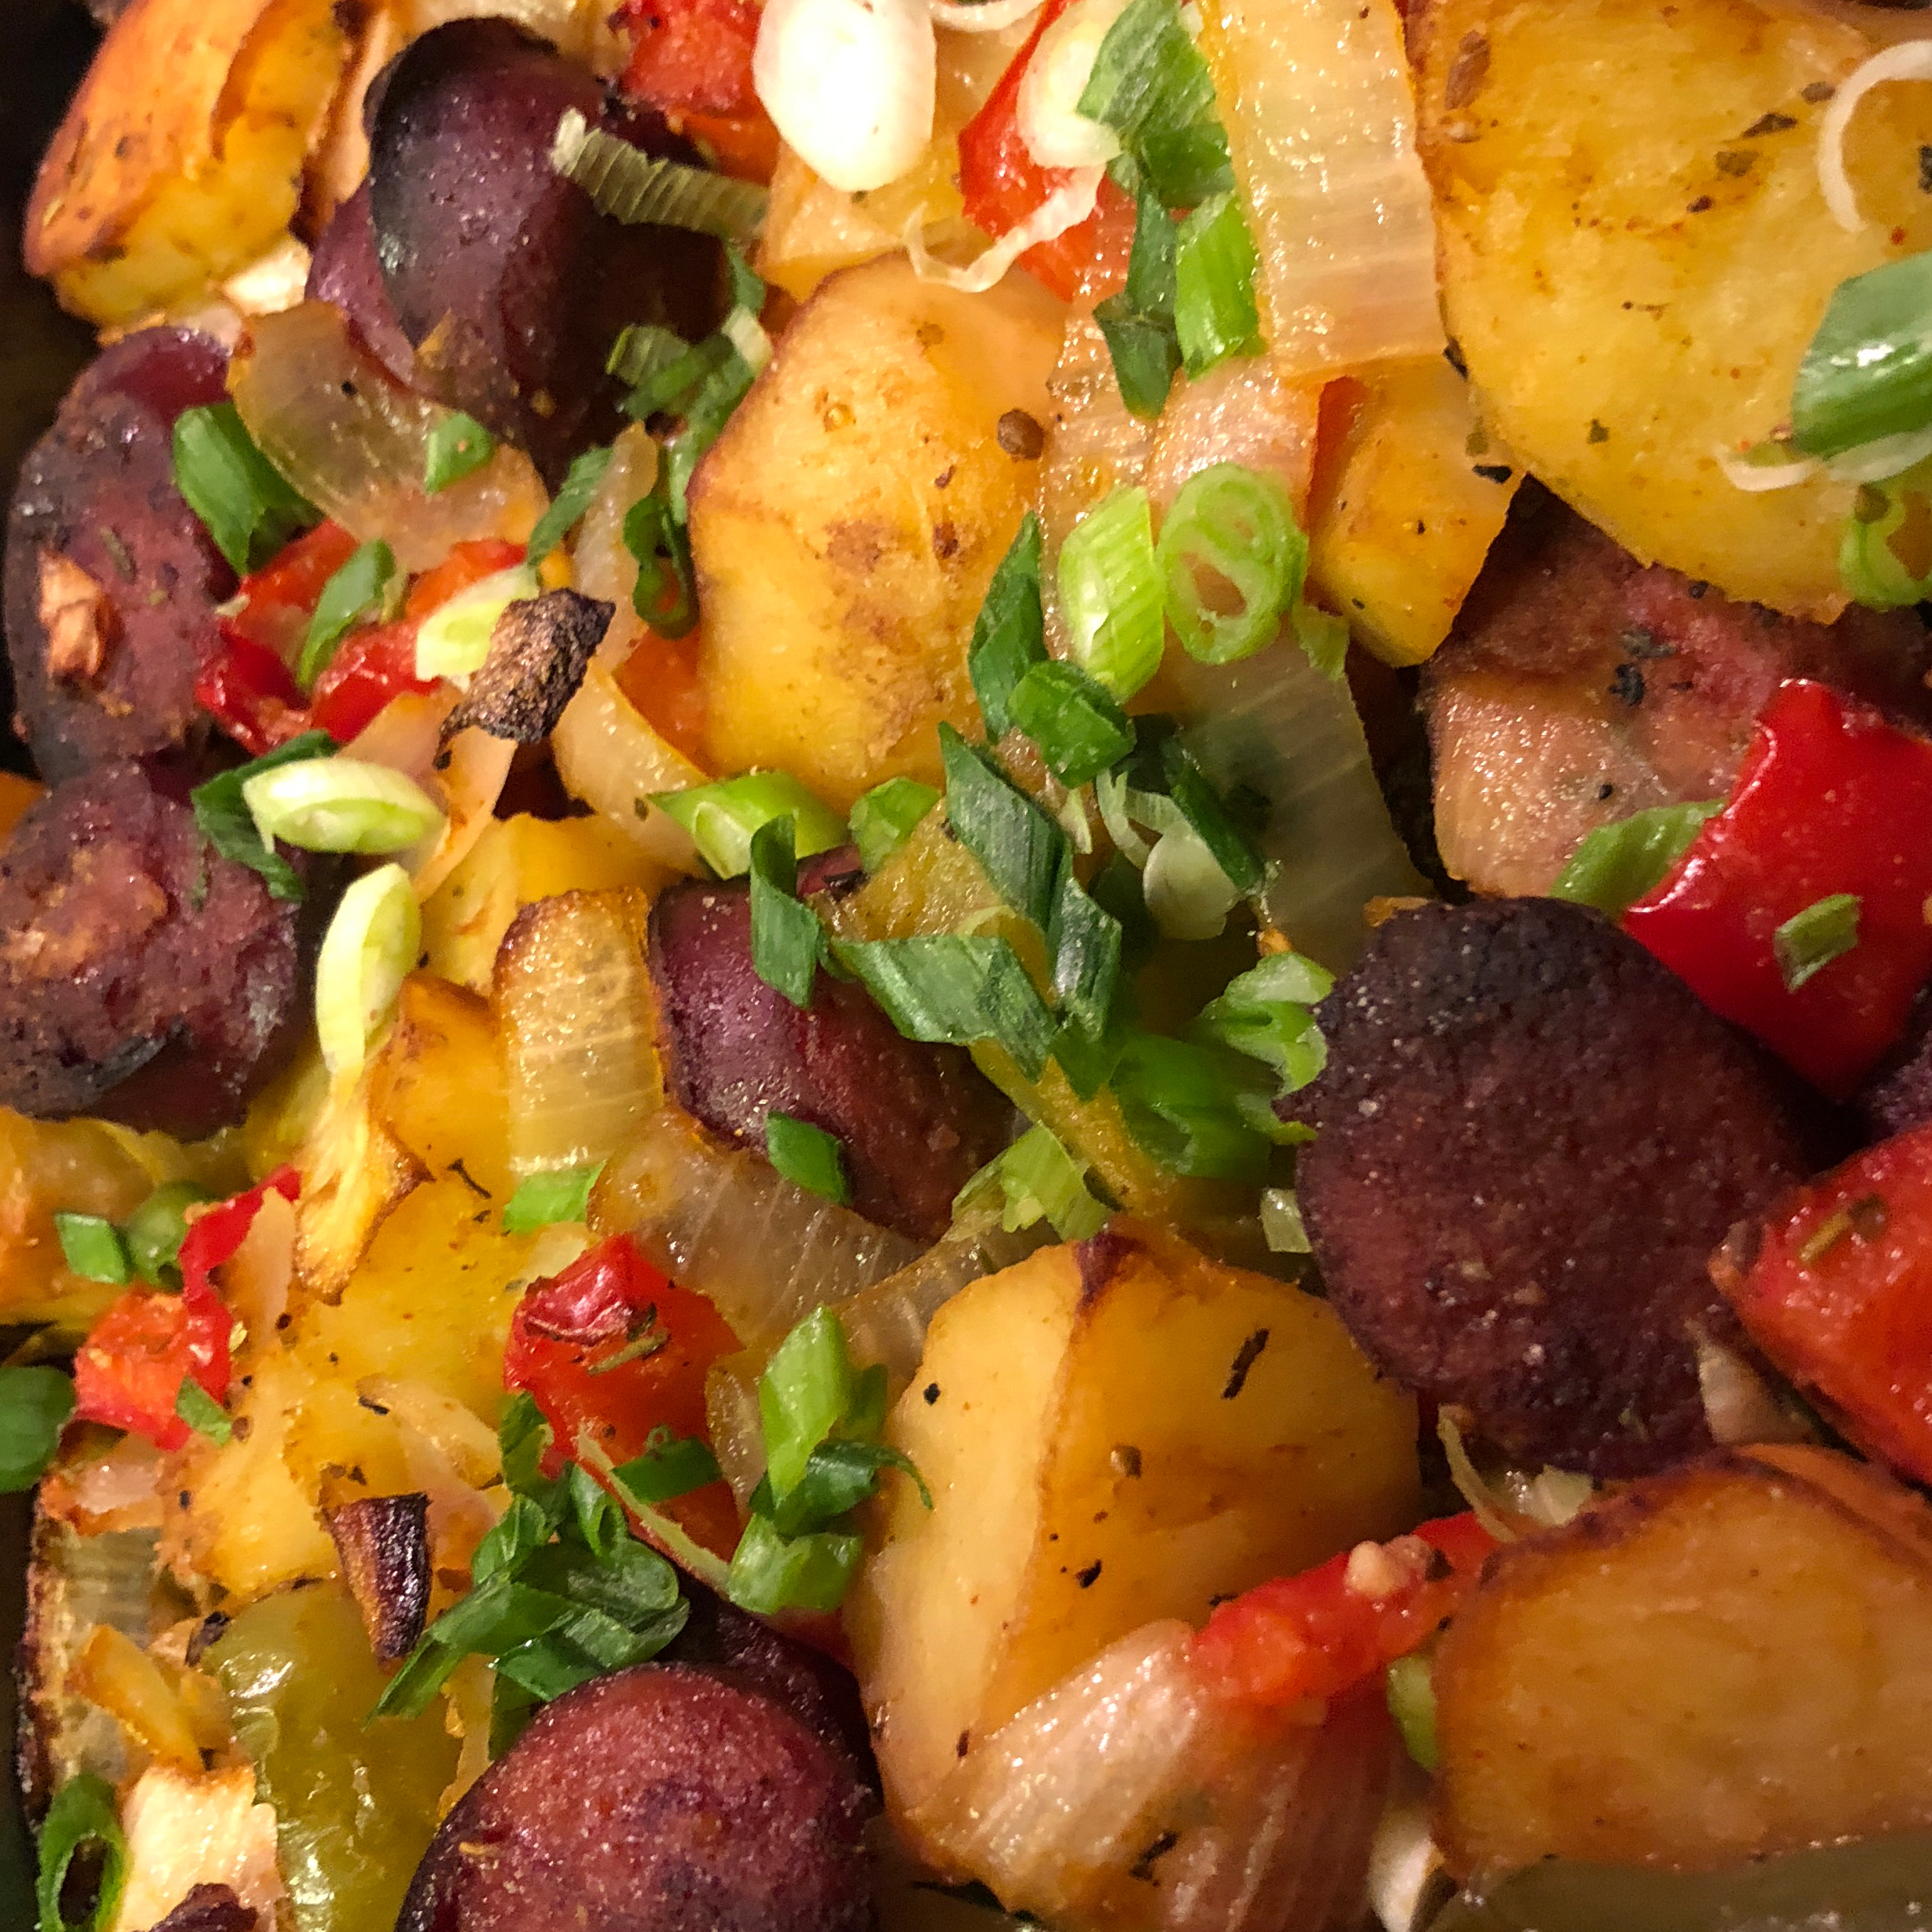 Sausage, Peppers, Onions, and Potato Bake Krystal Hamilton